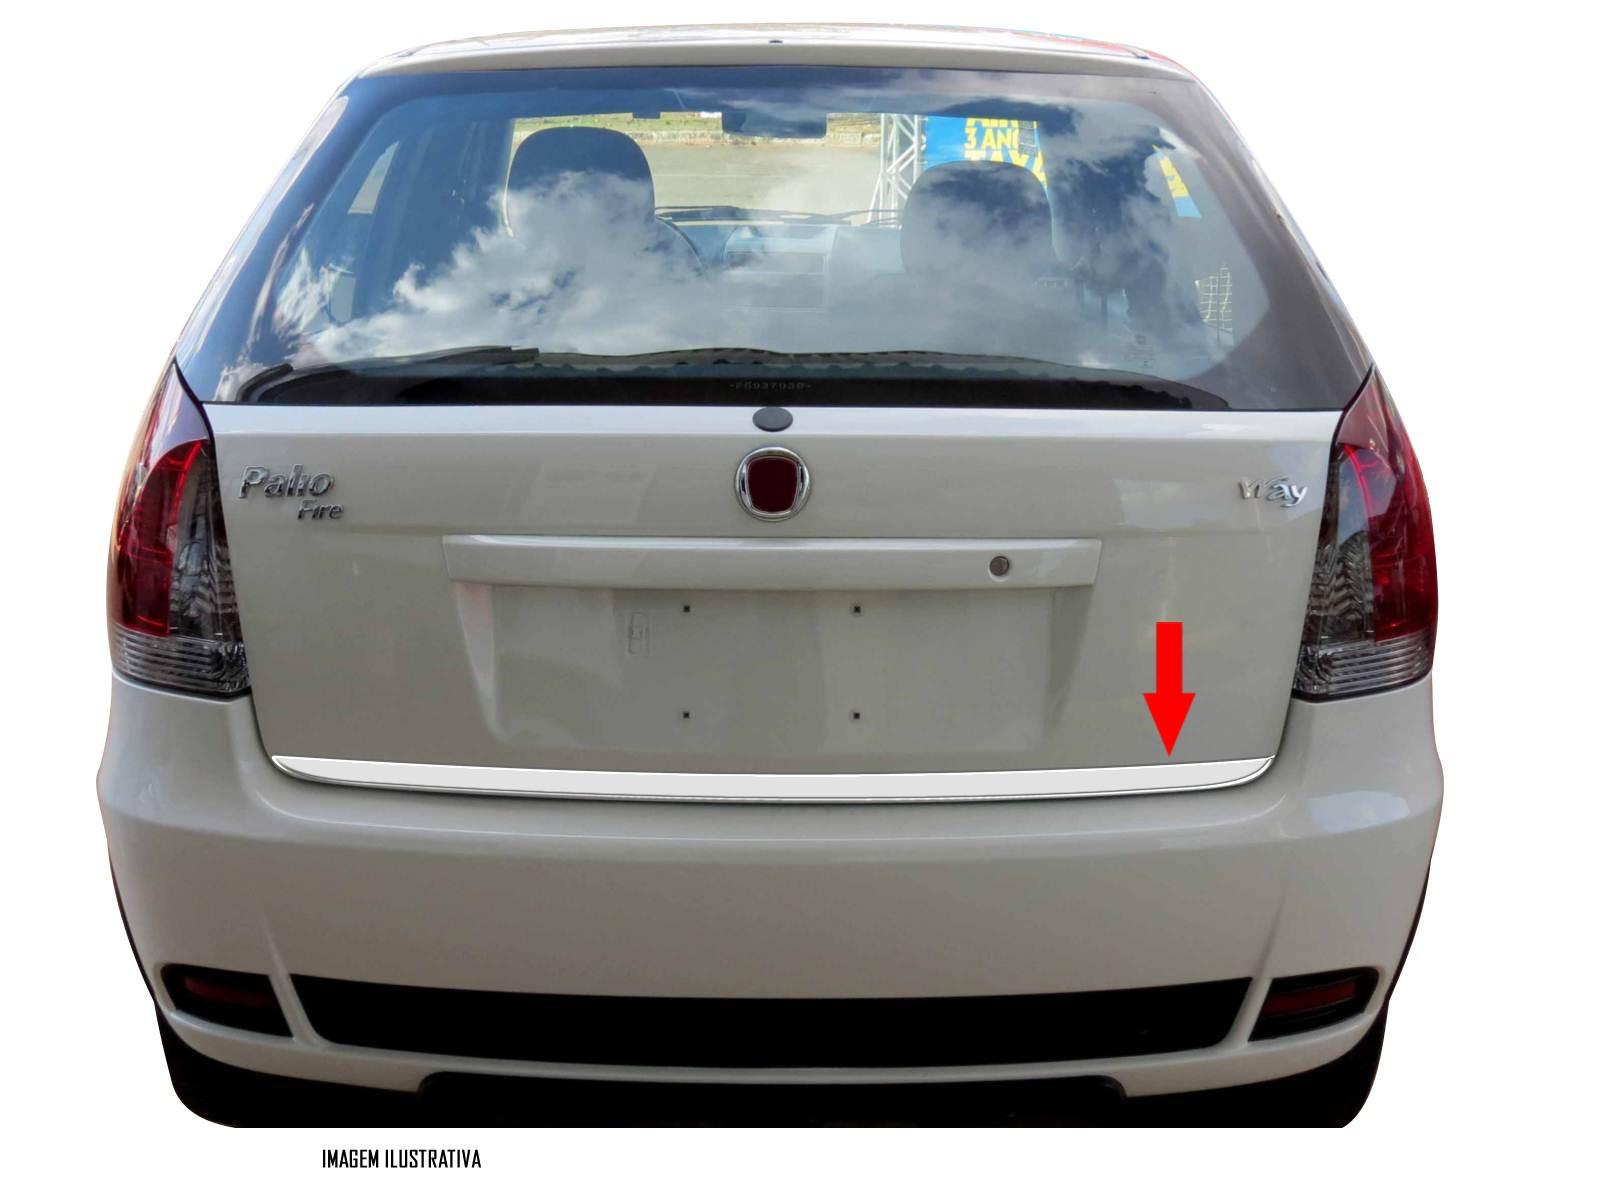 Friso Cromado Resinado Traseiro Porta Malas Fiat Palio 2004 2005 2006 2007